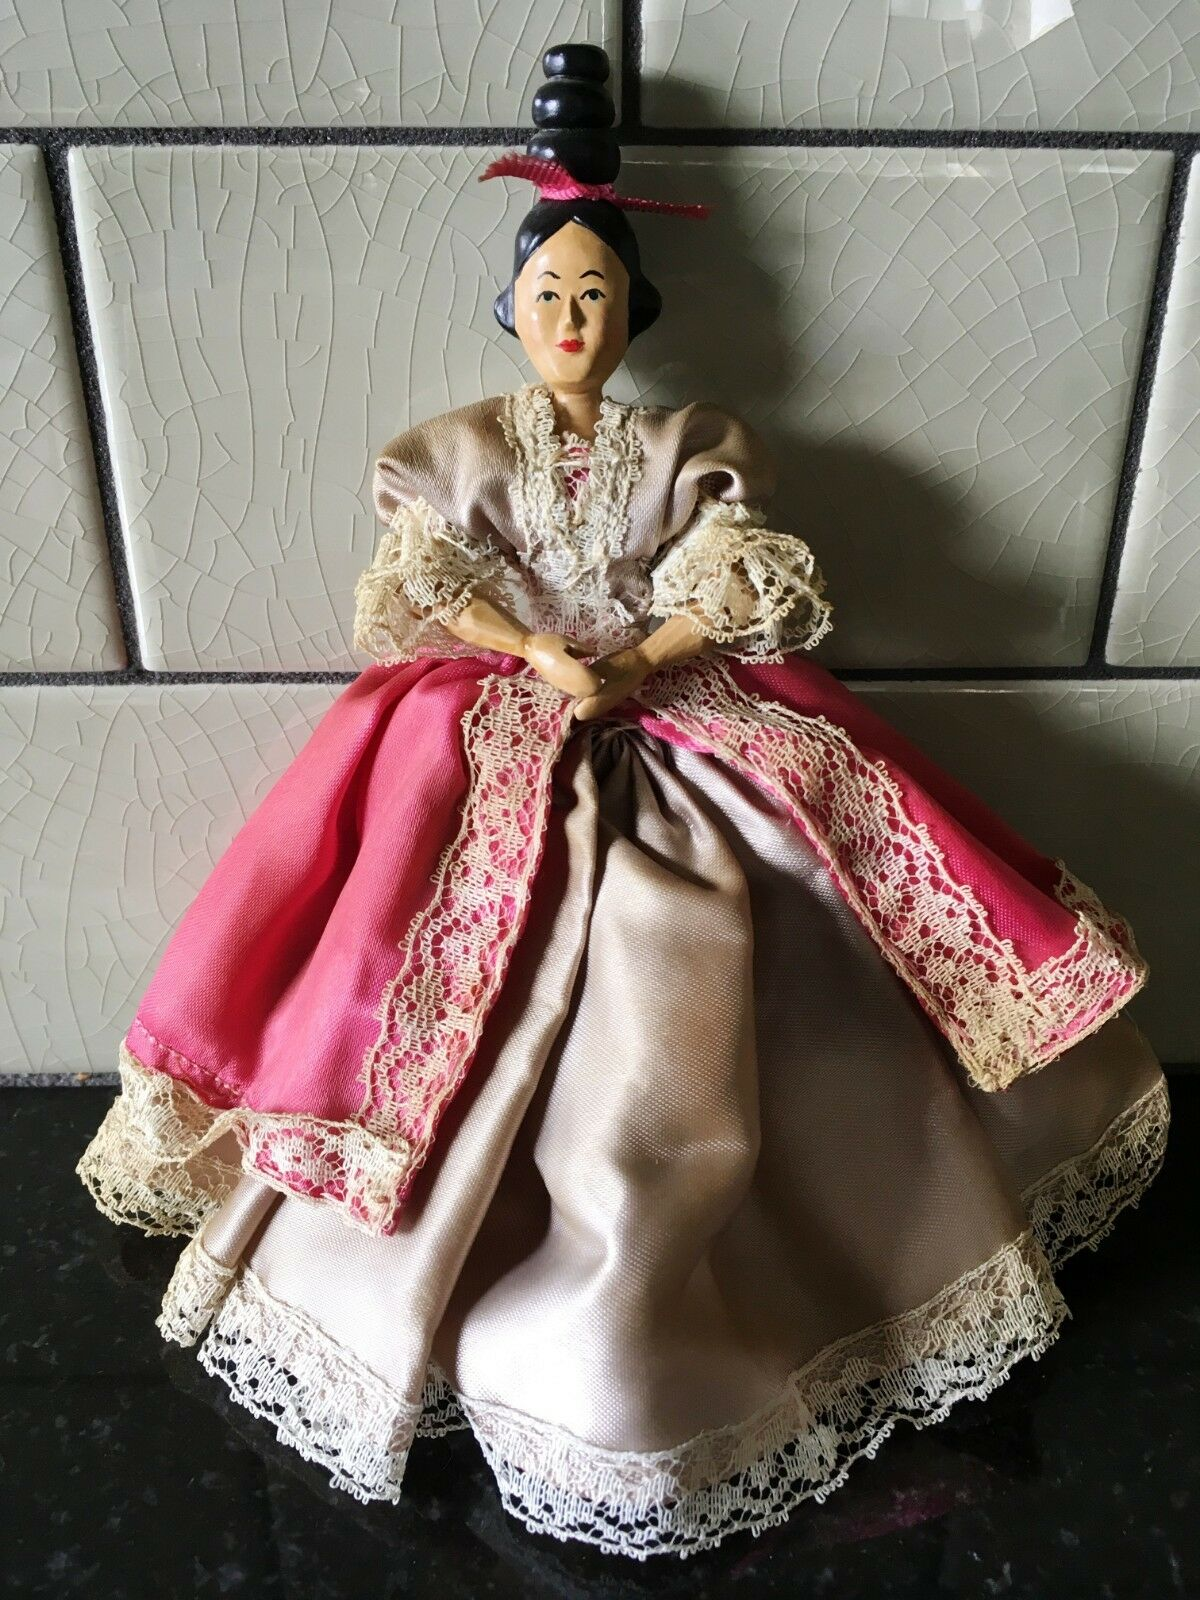 Artista Sherman Smith 7  Articulado De Madera Tallada muñeca vestida de casa de muñecas firmado 1962